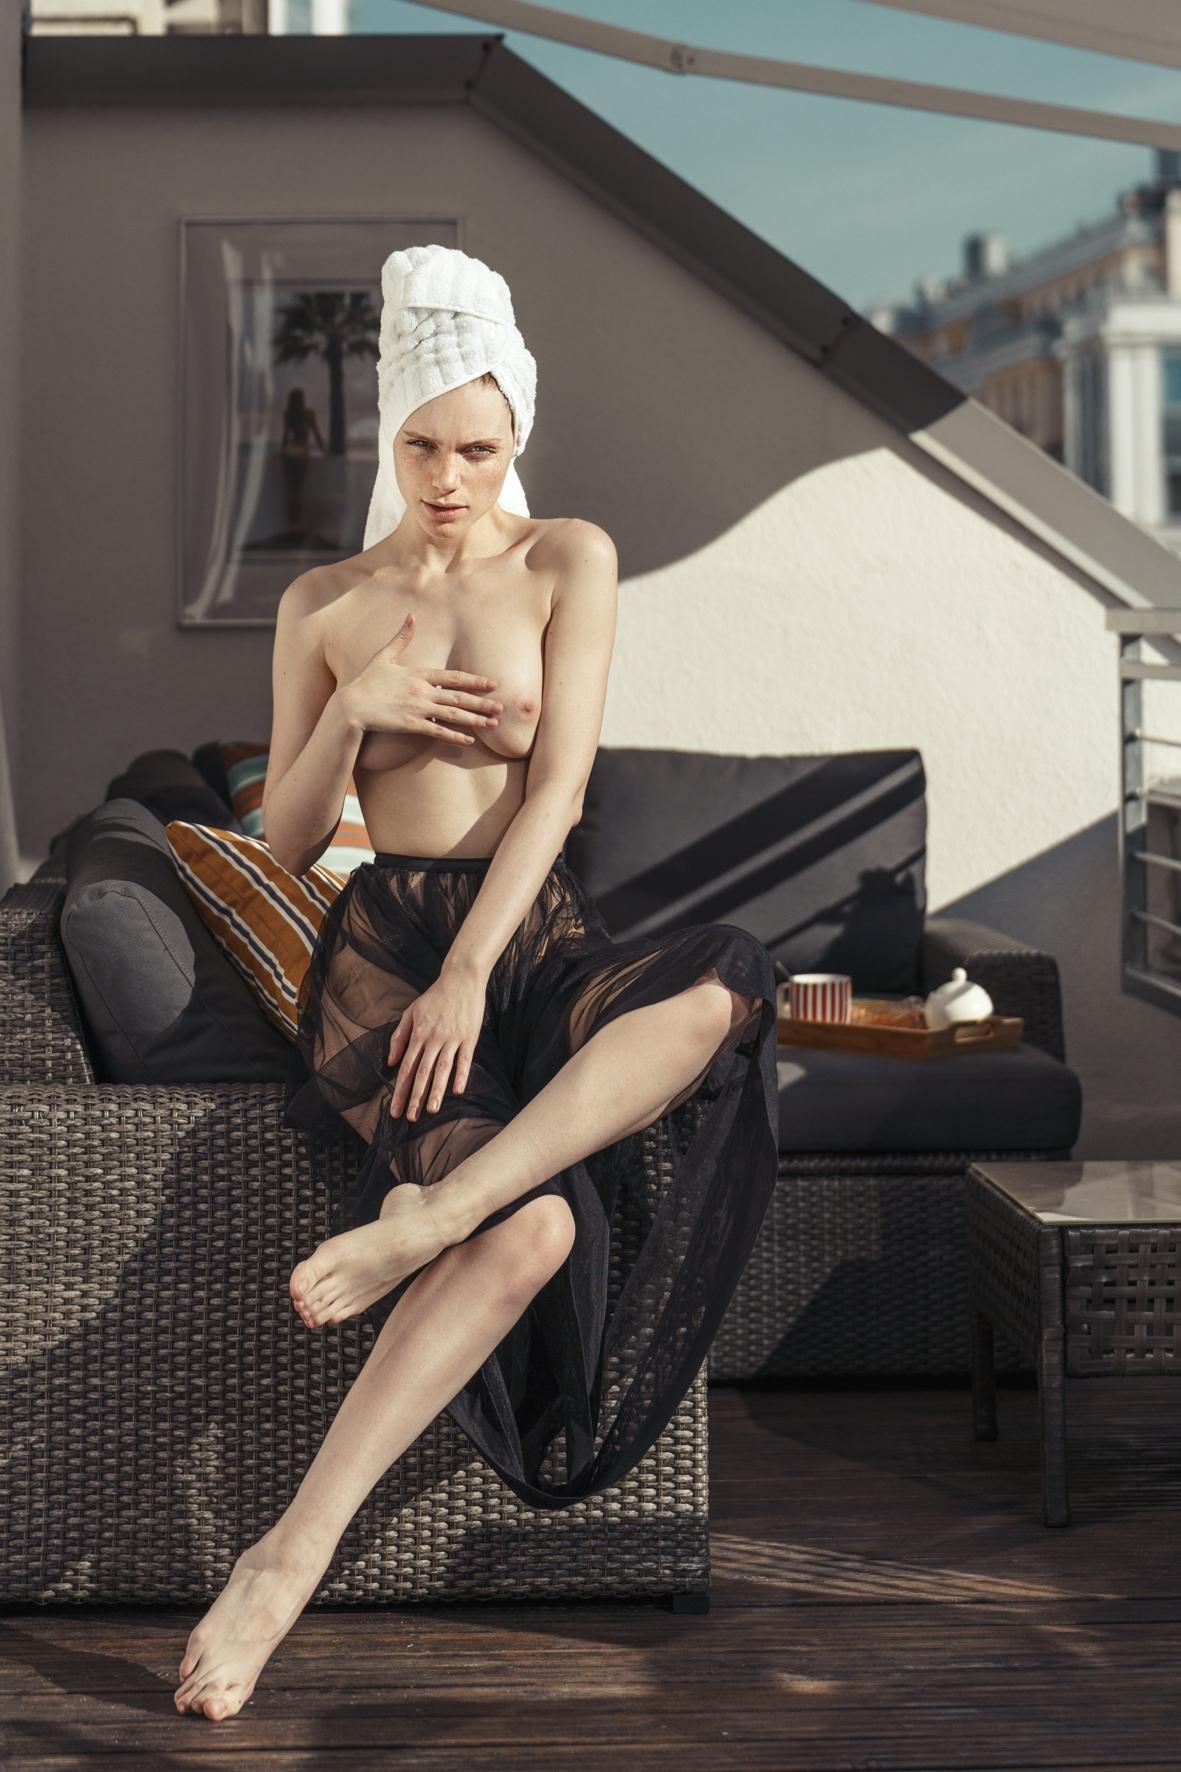 Viktoria Kolodko by Vladimir Serkov